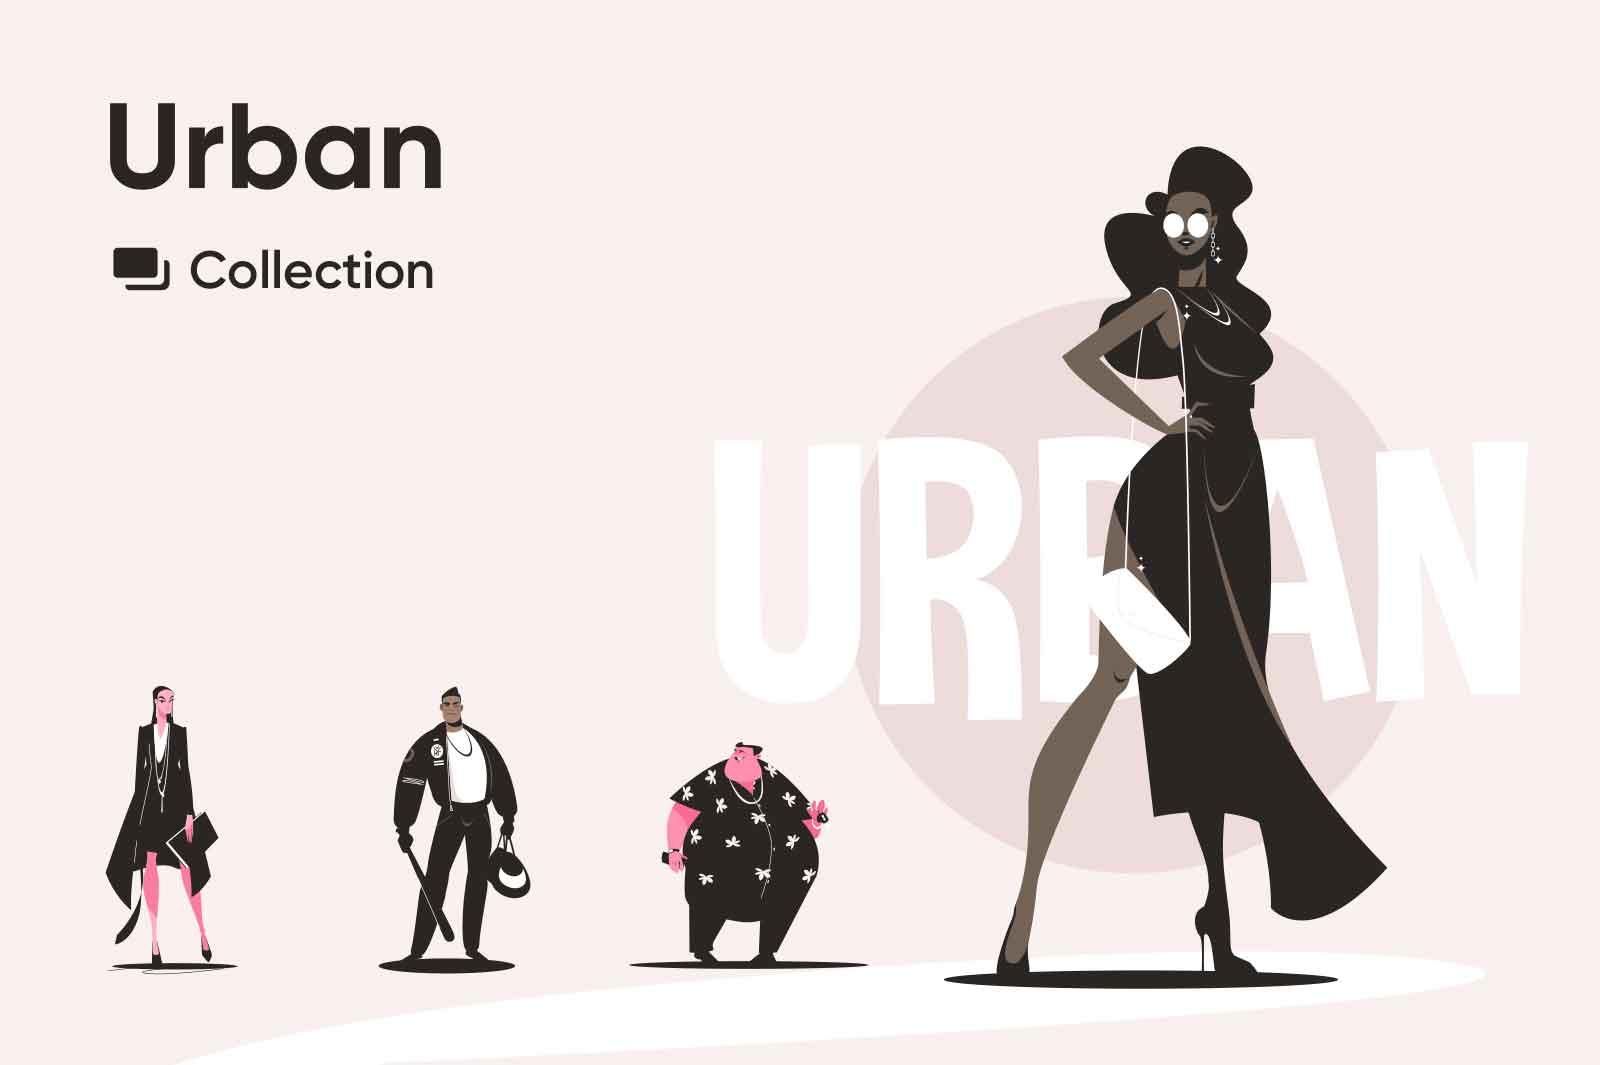 Stylish vector illustrations of city representatives